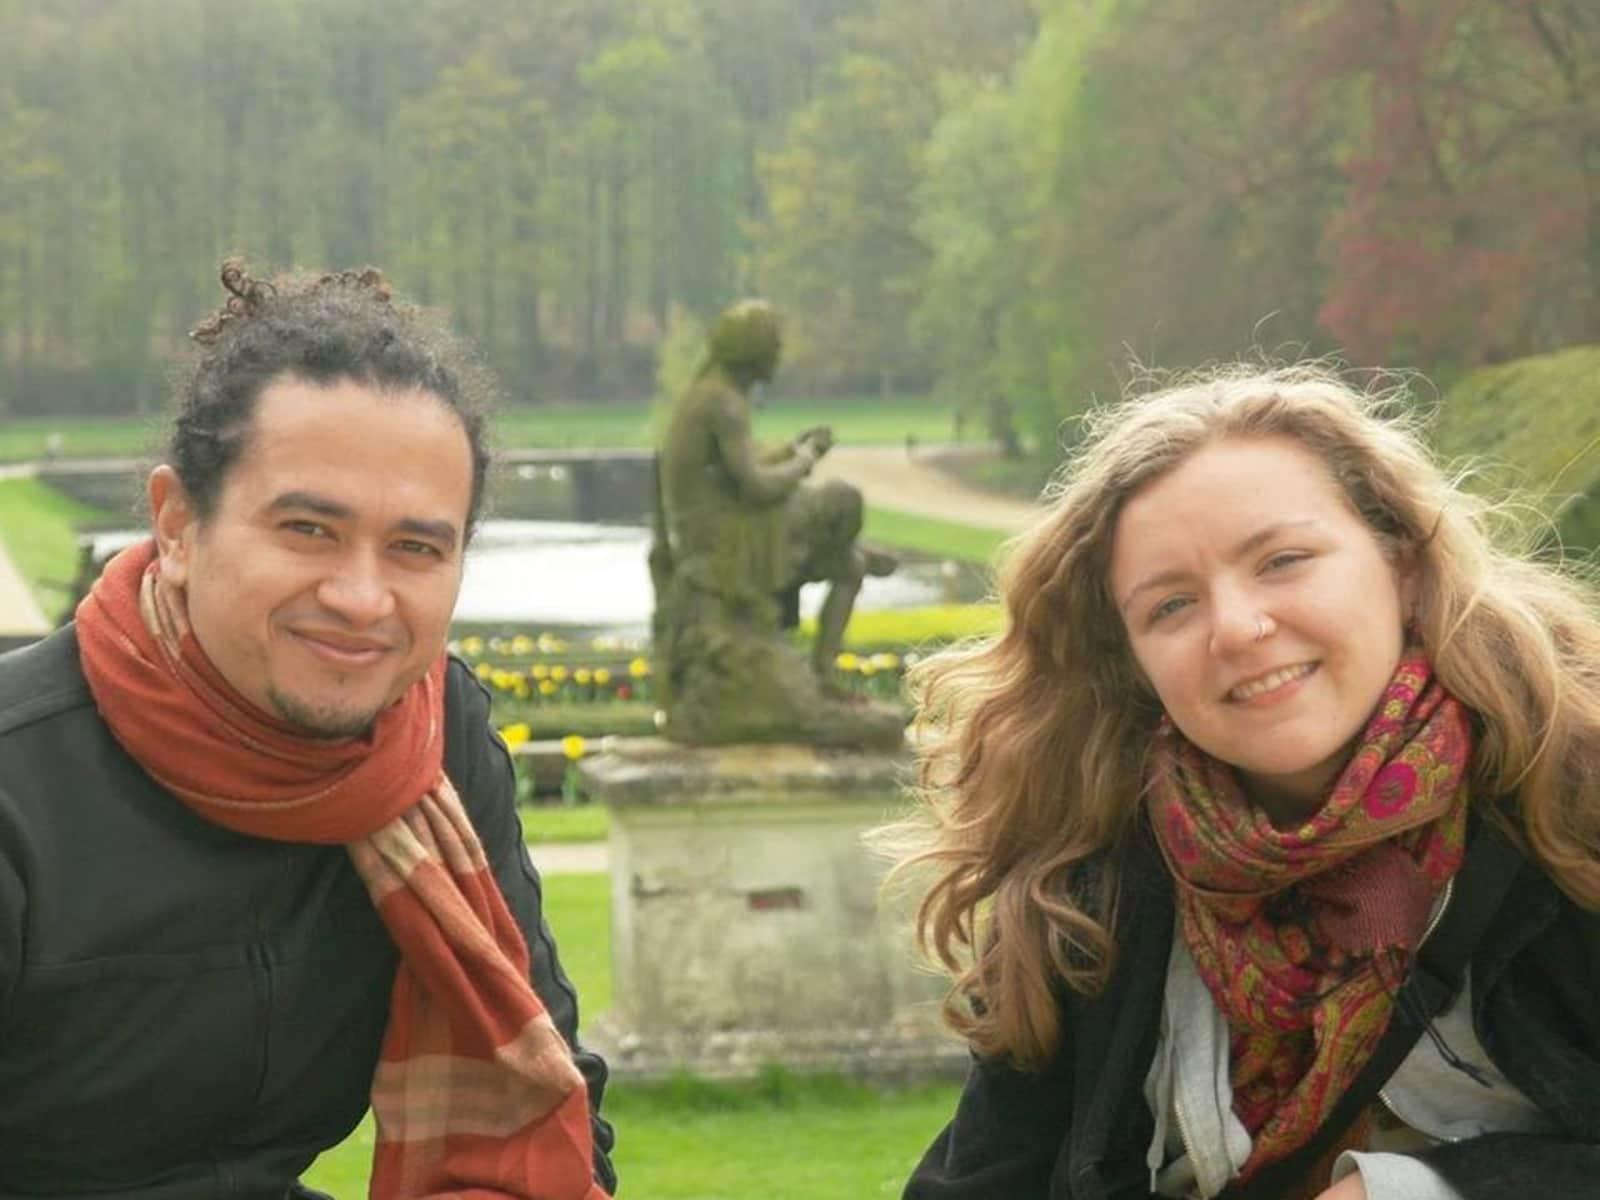 Benedikta & Manoel from Berlin, Germany